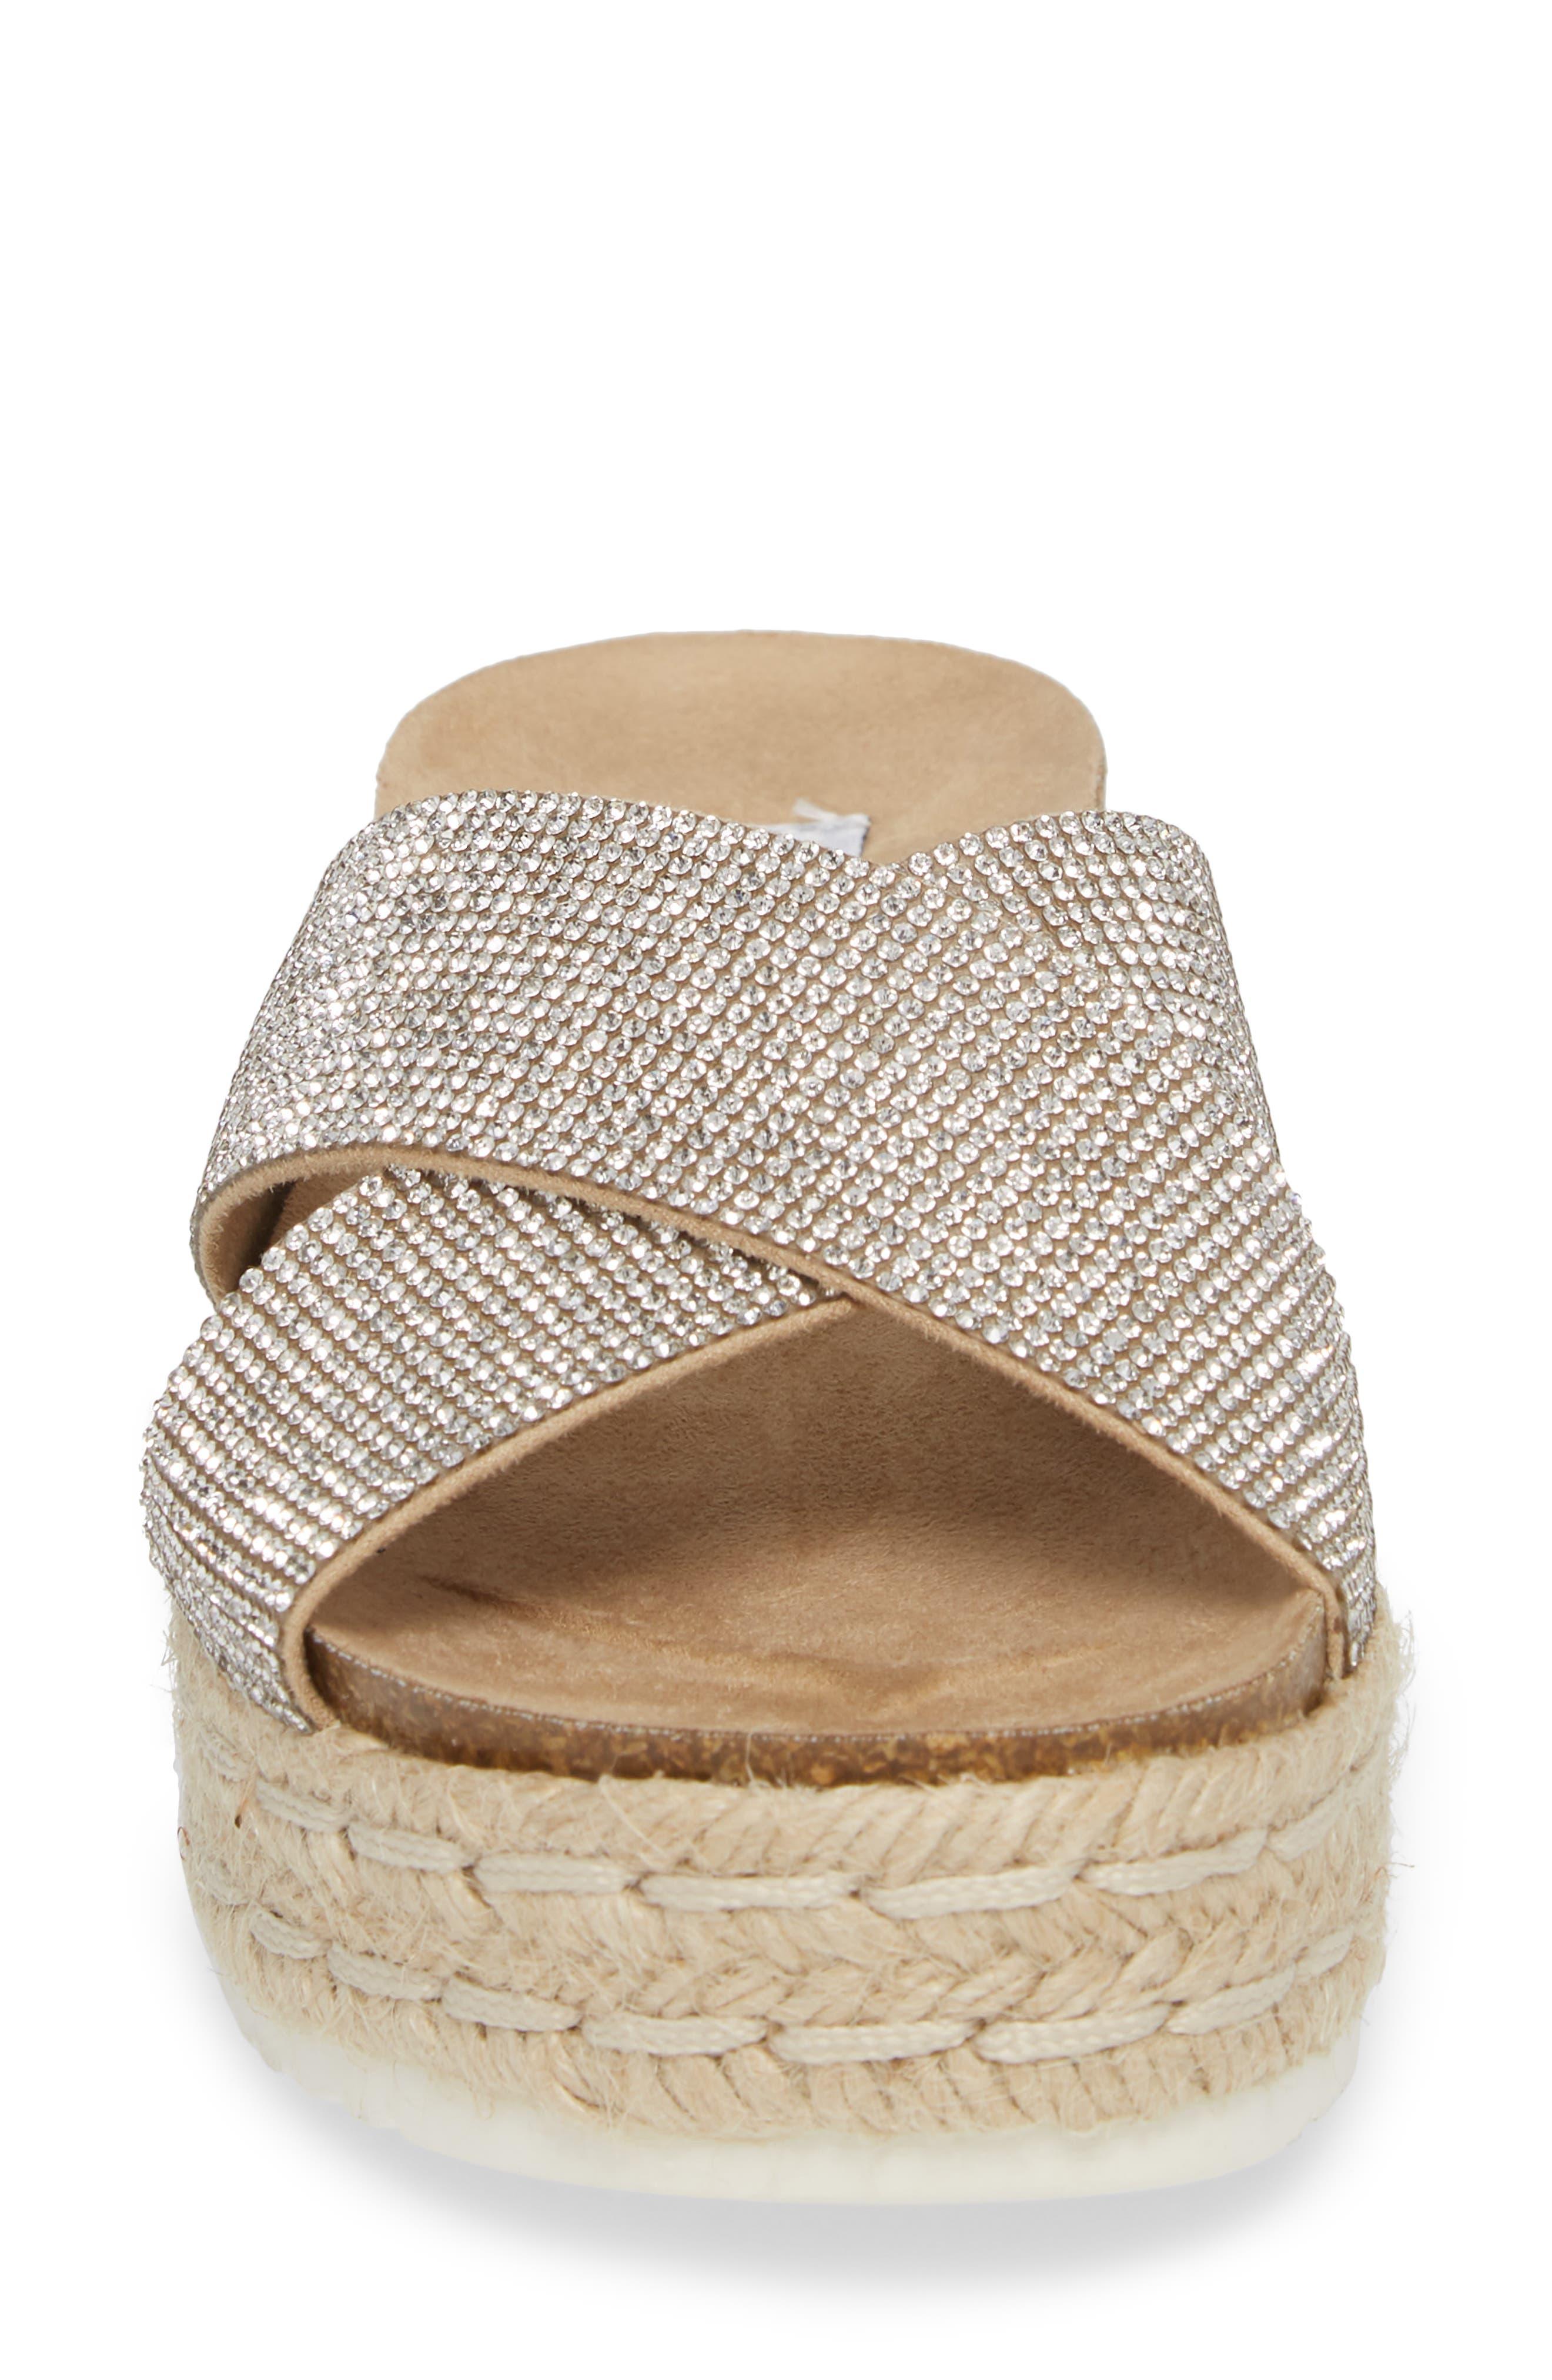 Arran-R Platform Espadrille Sandal,                             Alternate thumbnail 8, color,